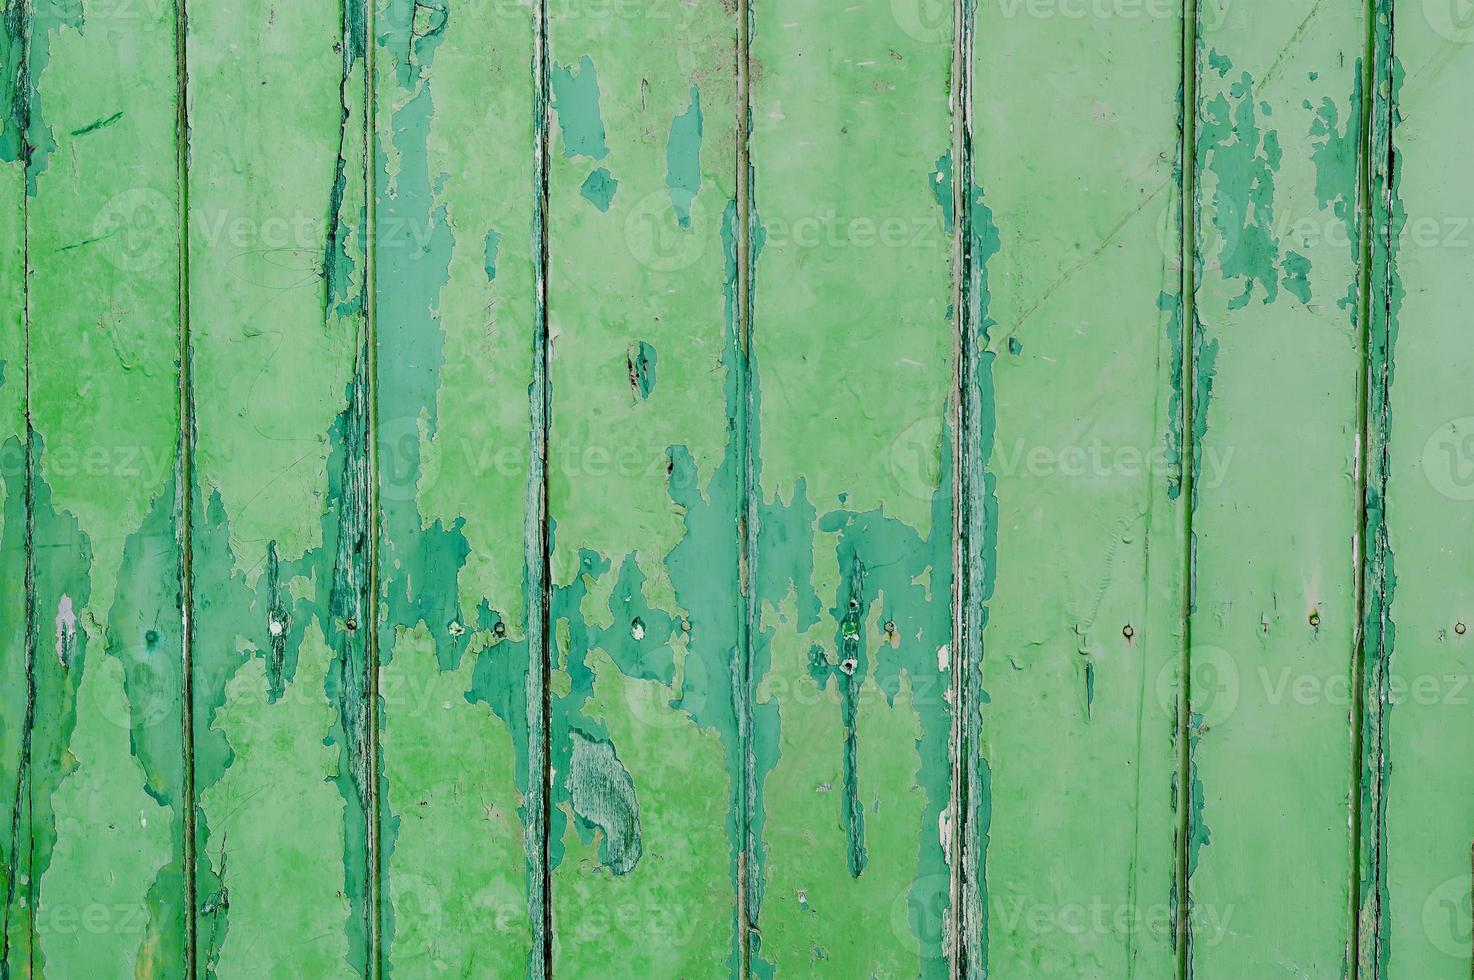 pintura descascarada pared de madera verde foto